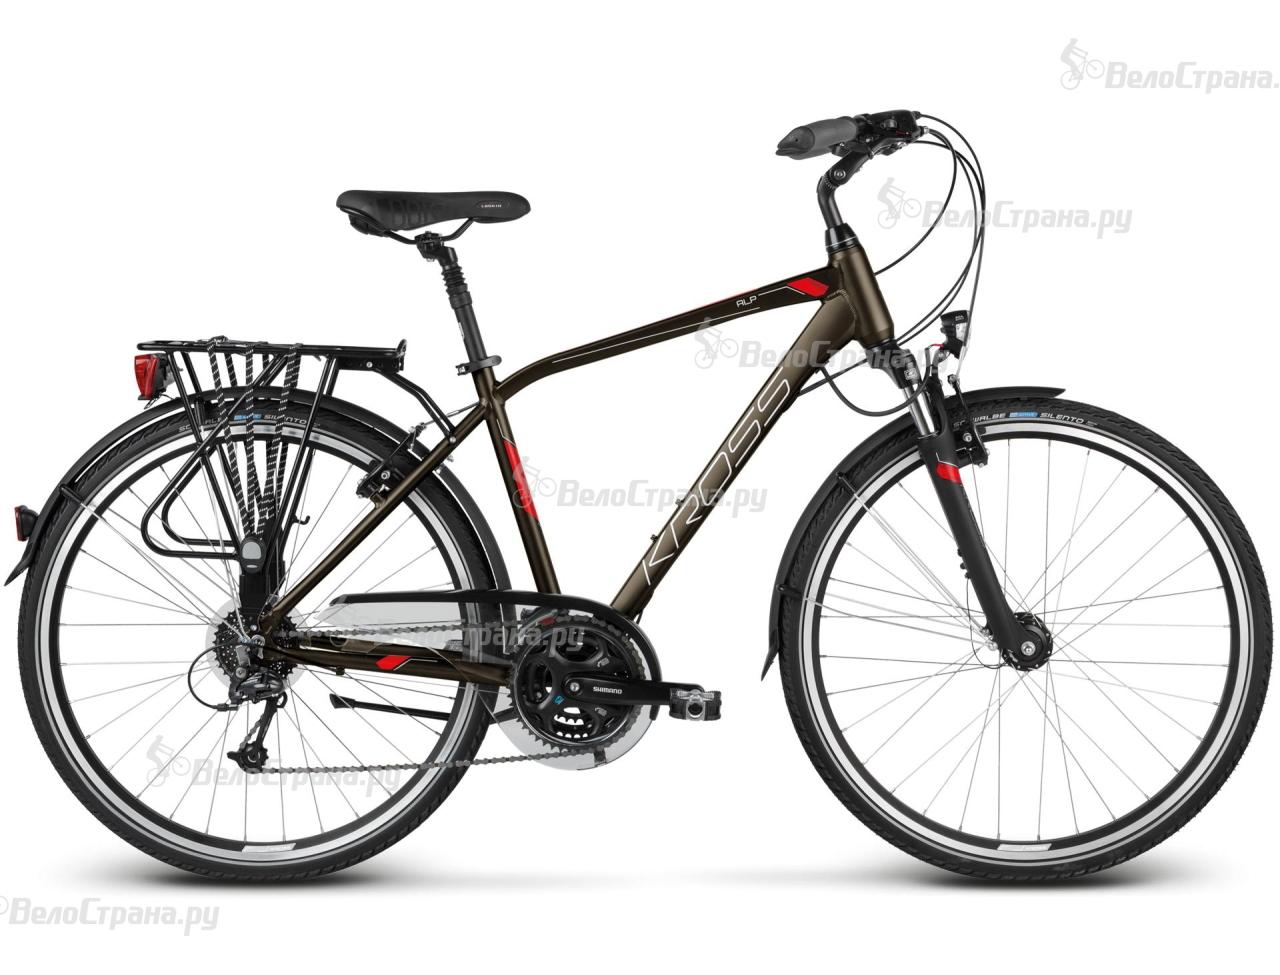 Велосипед Kross Trans Alp (2017)